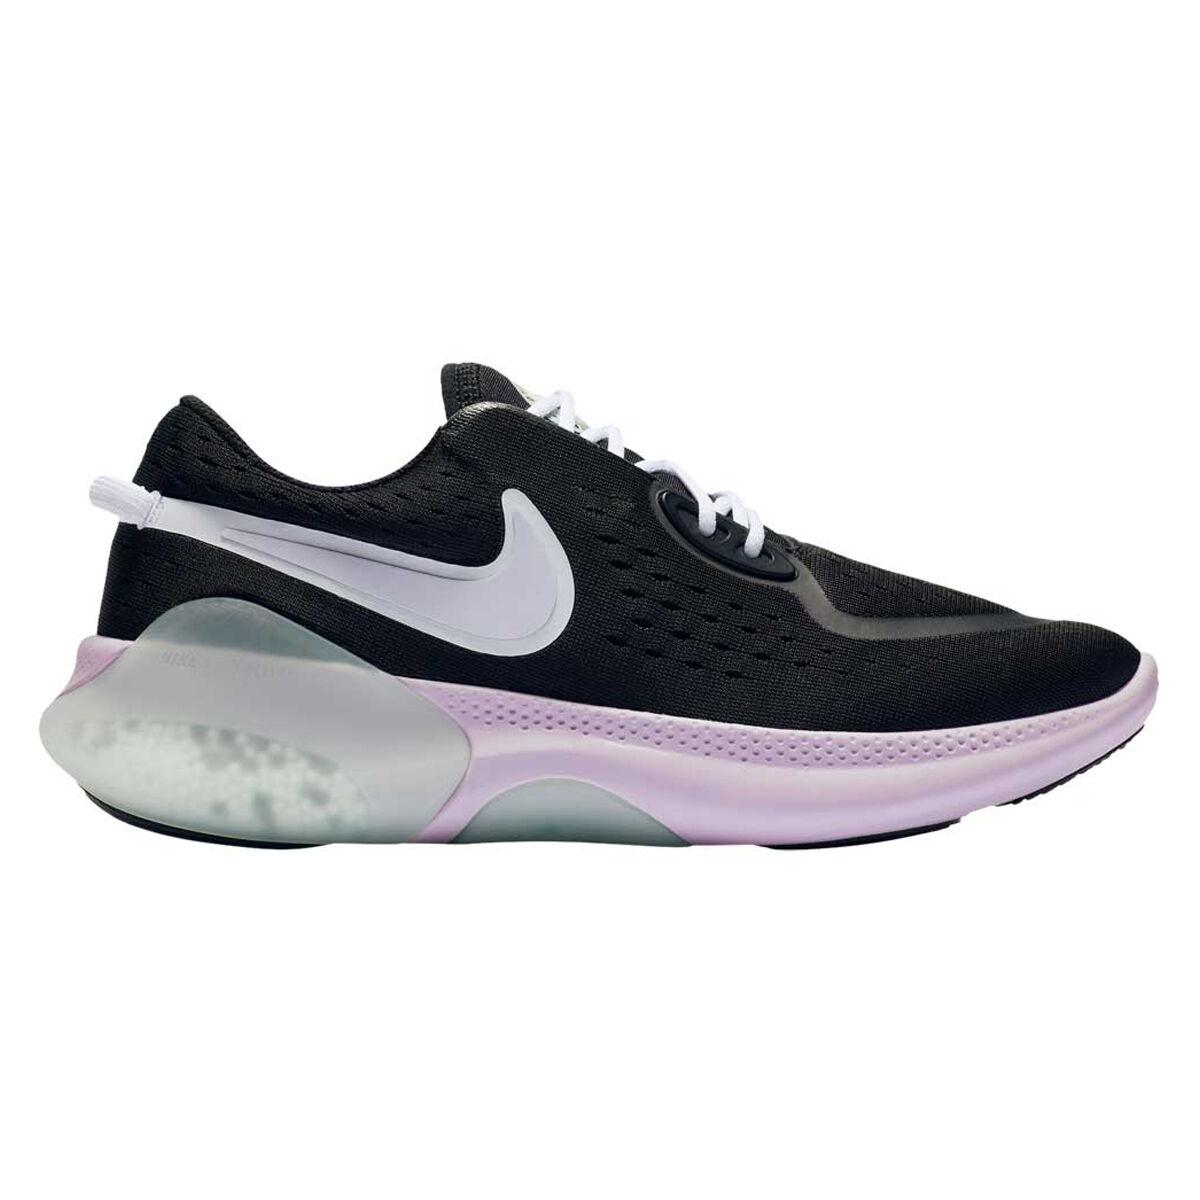 Womens Shoes Womens Footwear rebel